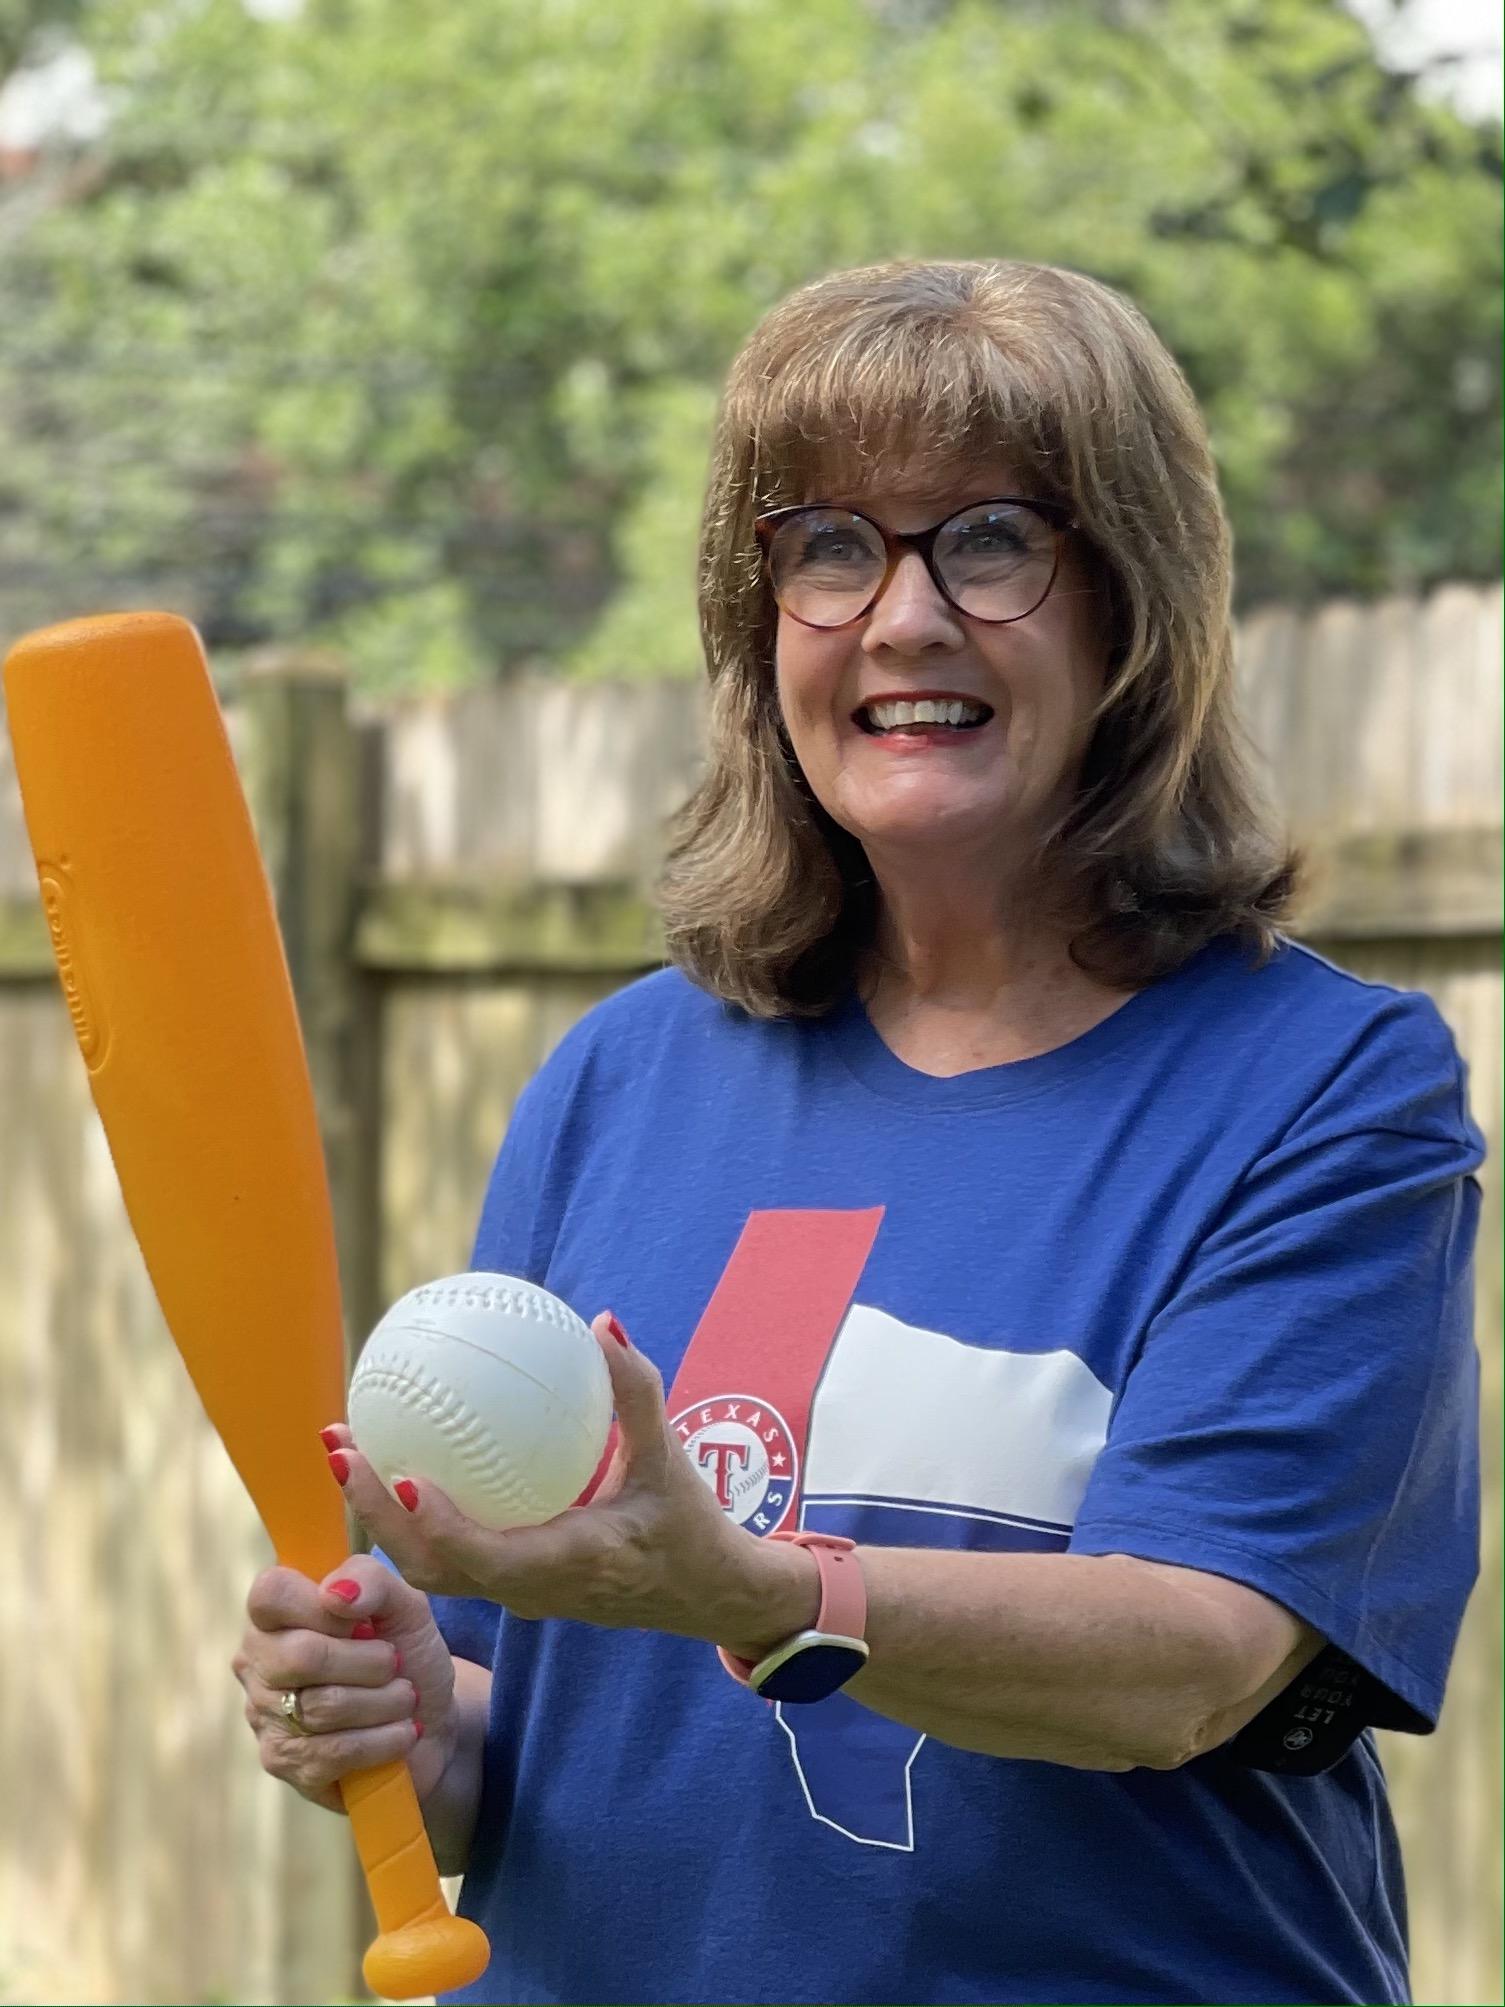 Stryker hits a homerun with minor league baseball partnership